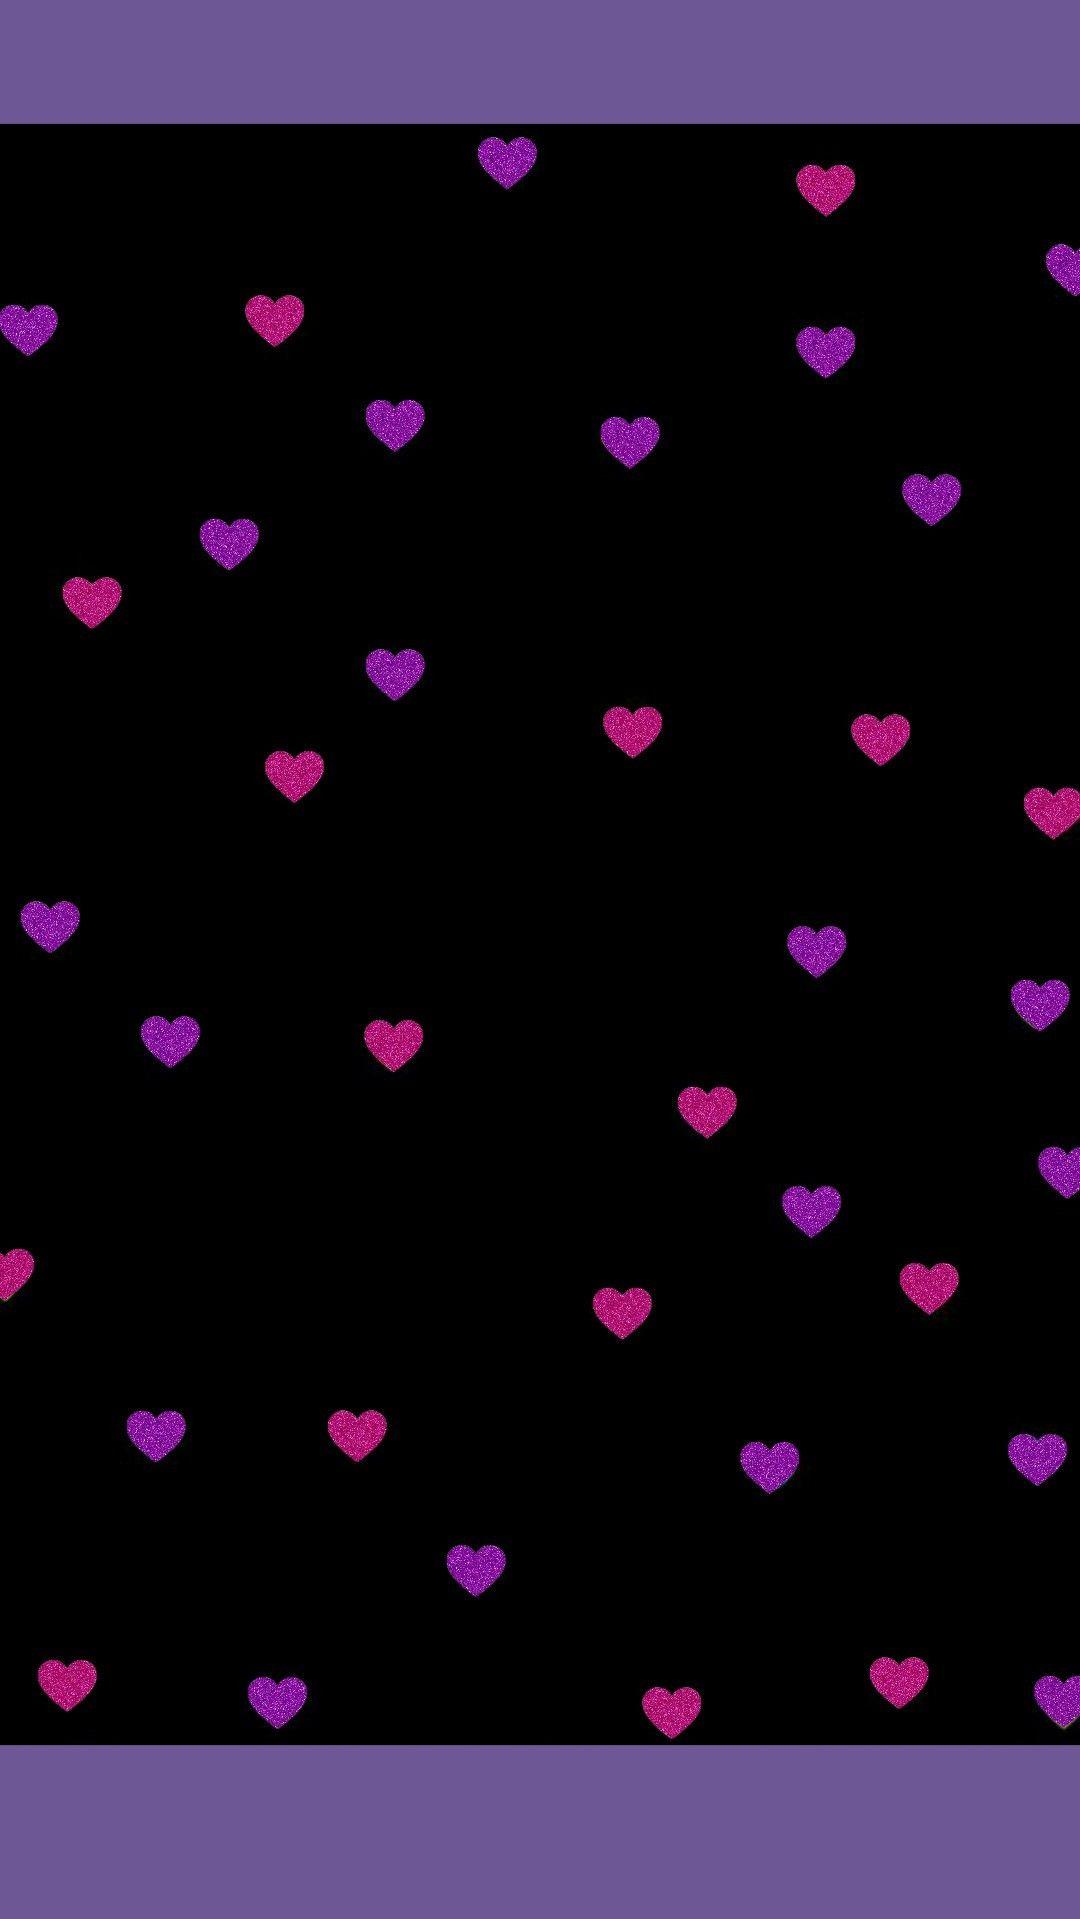 Pin By J E On Hearts Glamour Wallpaper Heart Wallpaper Love Wallpaper